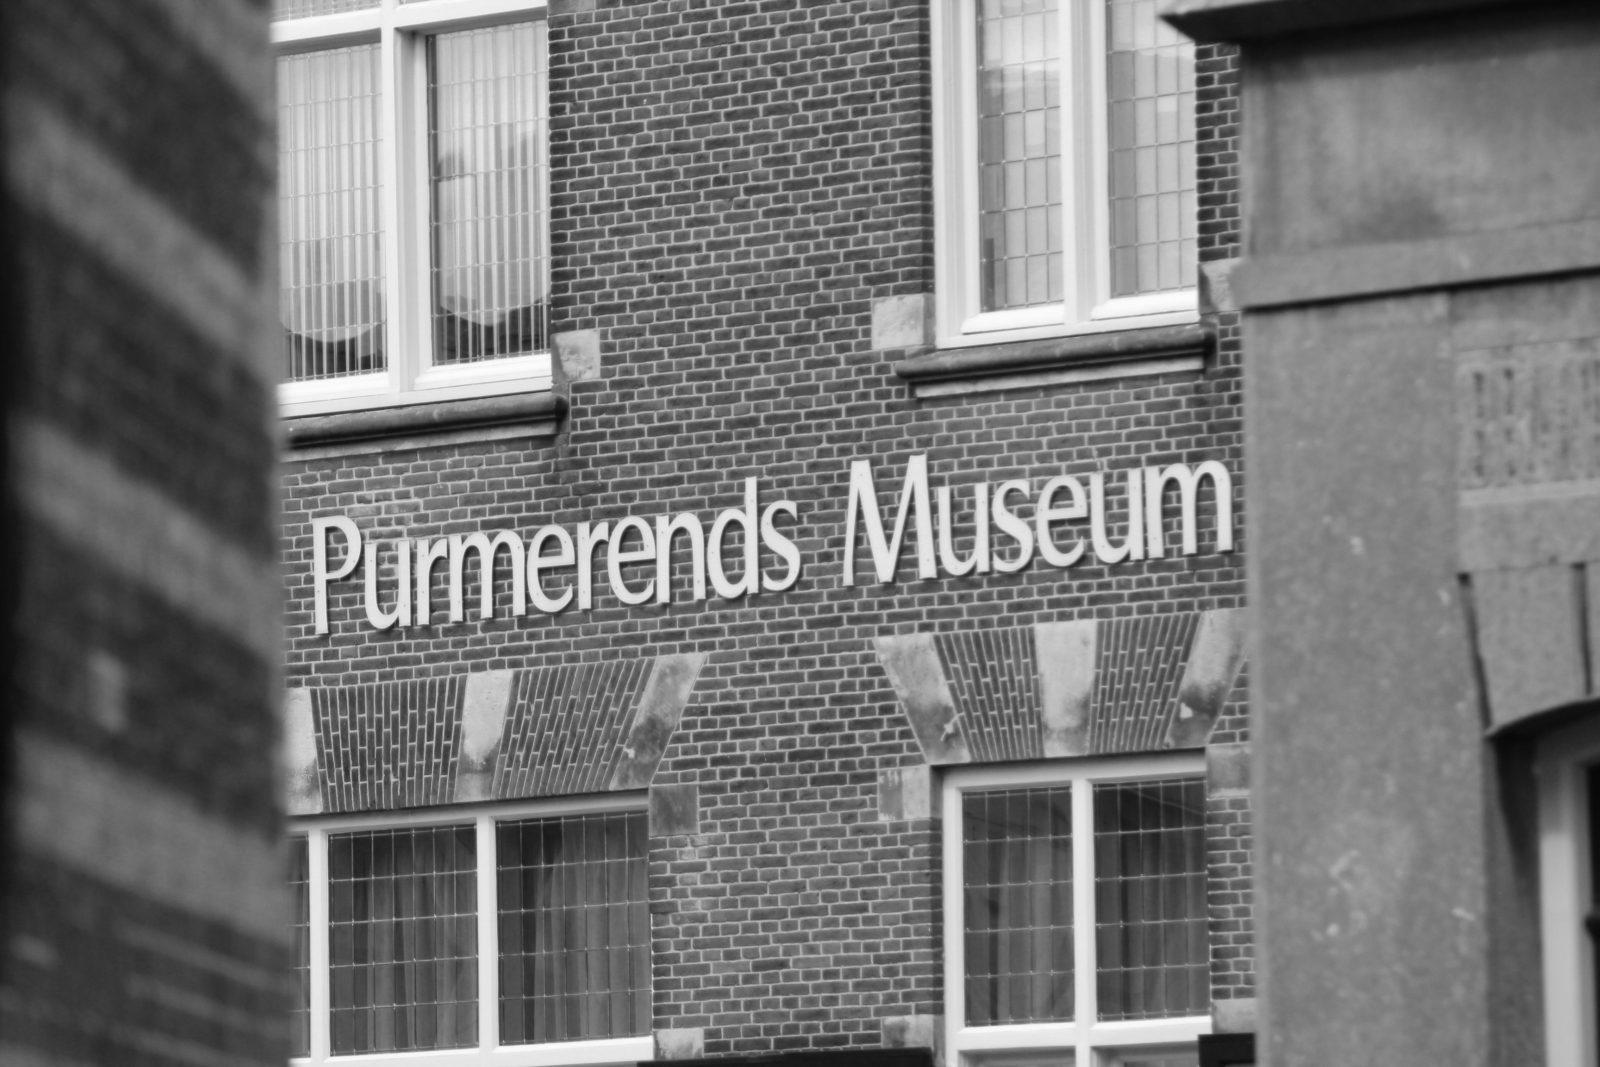 Purmerends museum